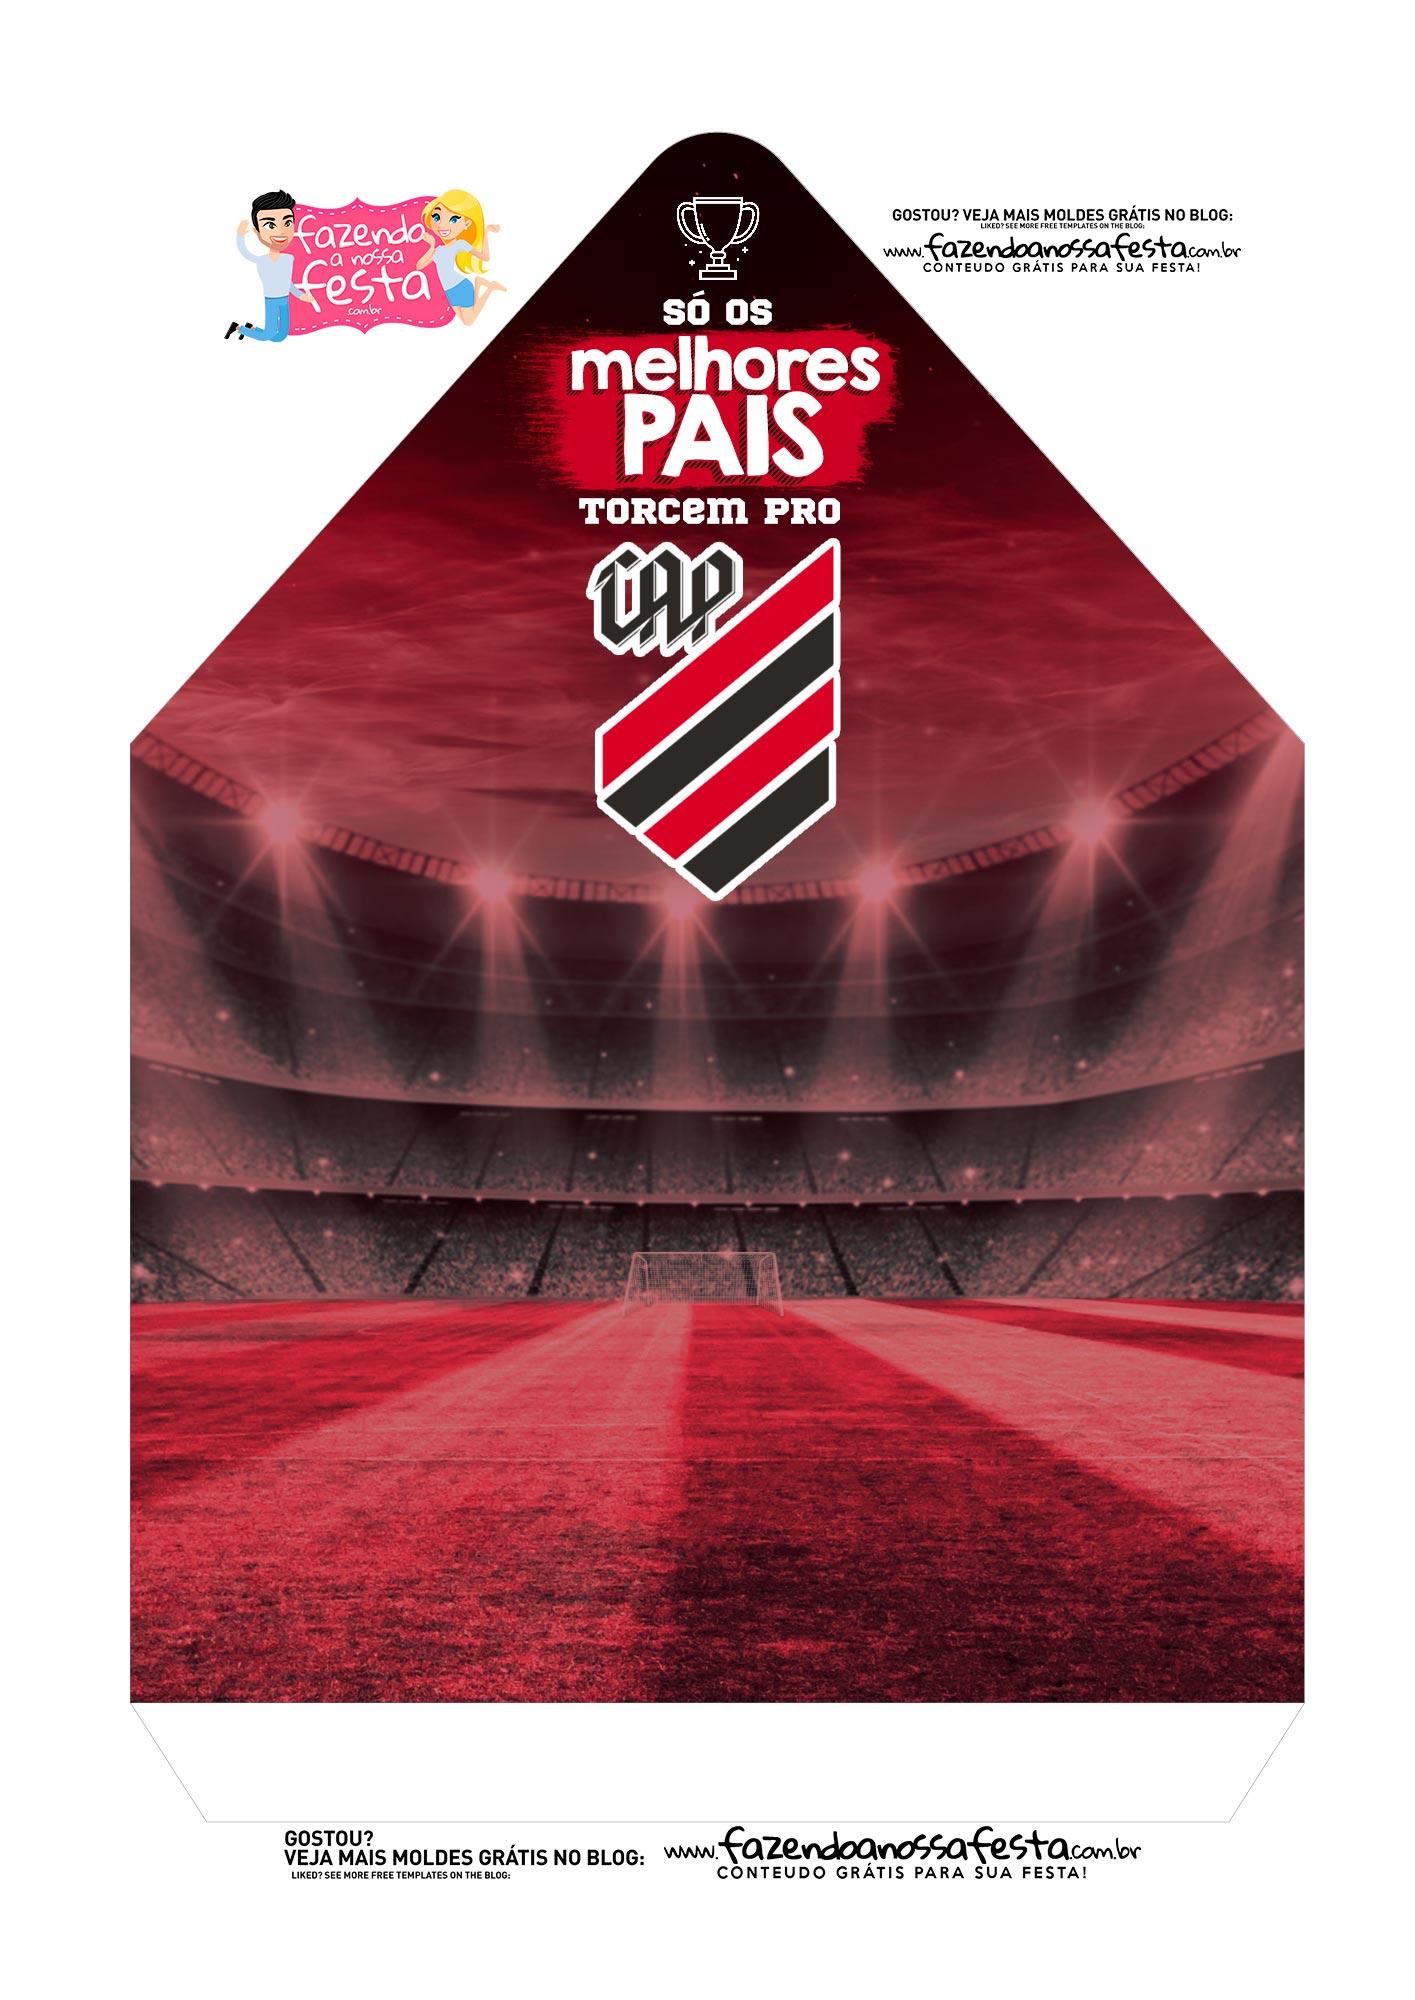 Caixa Envelope Pai Clube Atletico Paranaense 2